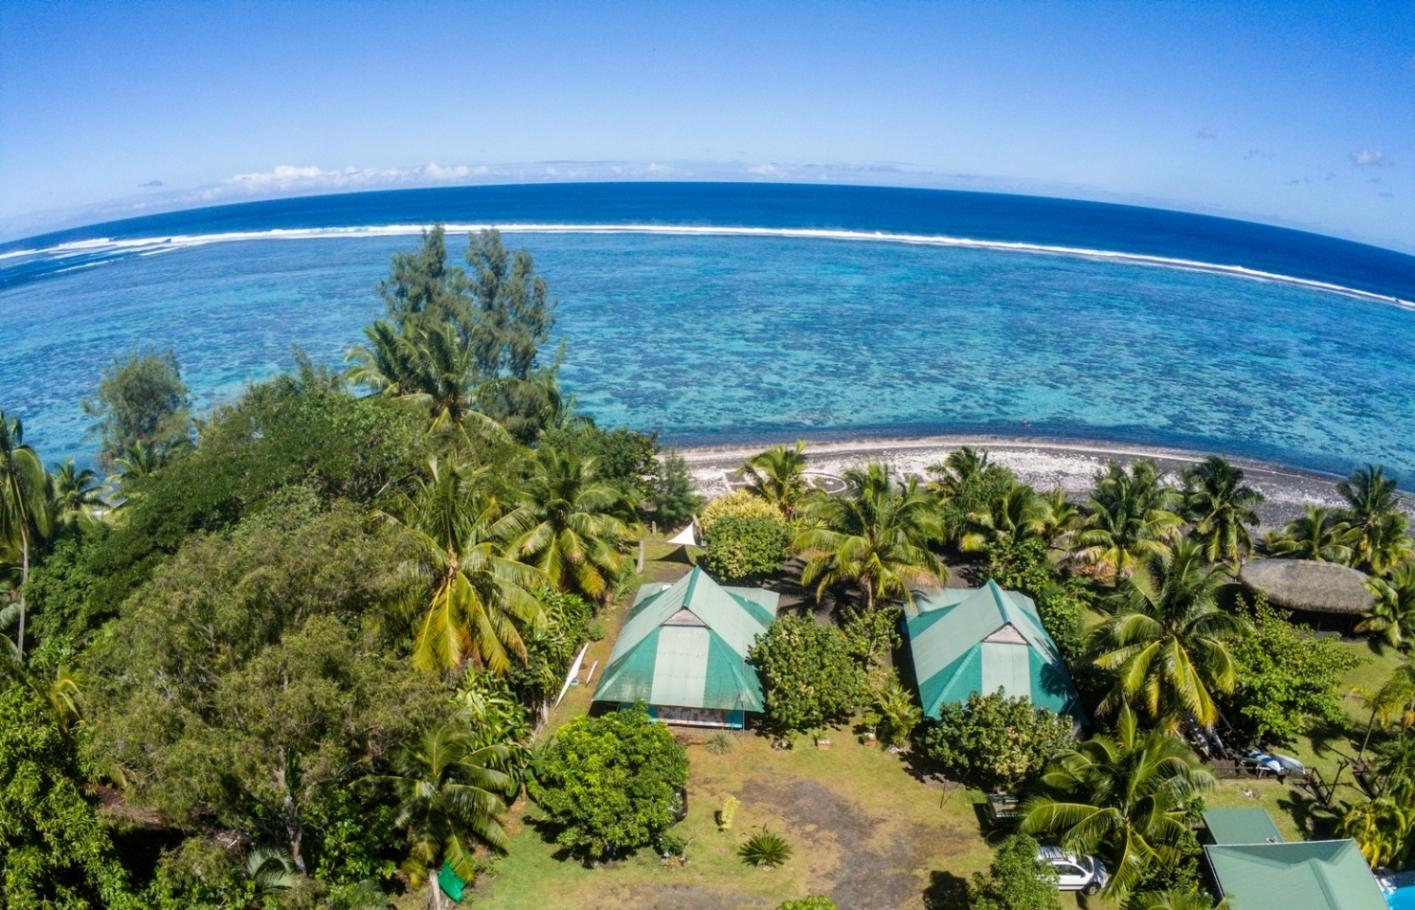 https://tahititourisme.kr/wp-content/uploads/2019/08/copie-Tahiti-tourisme-948ko.jpg